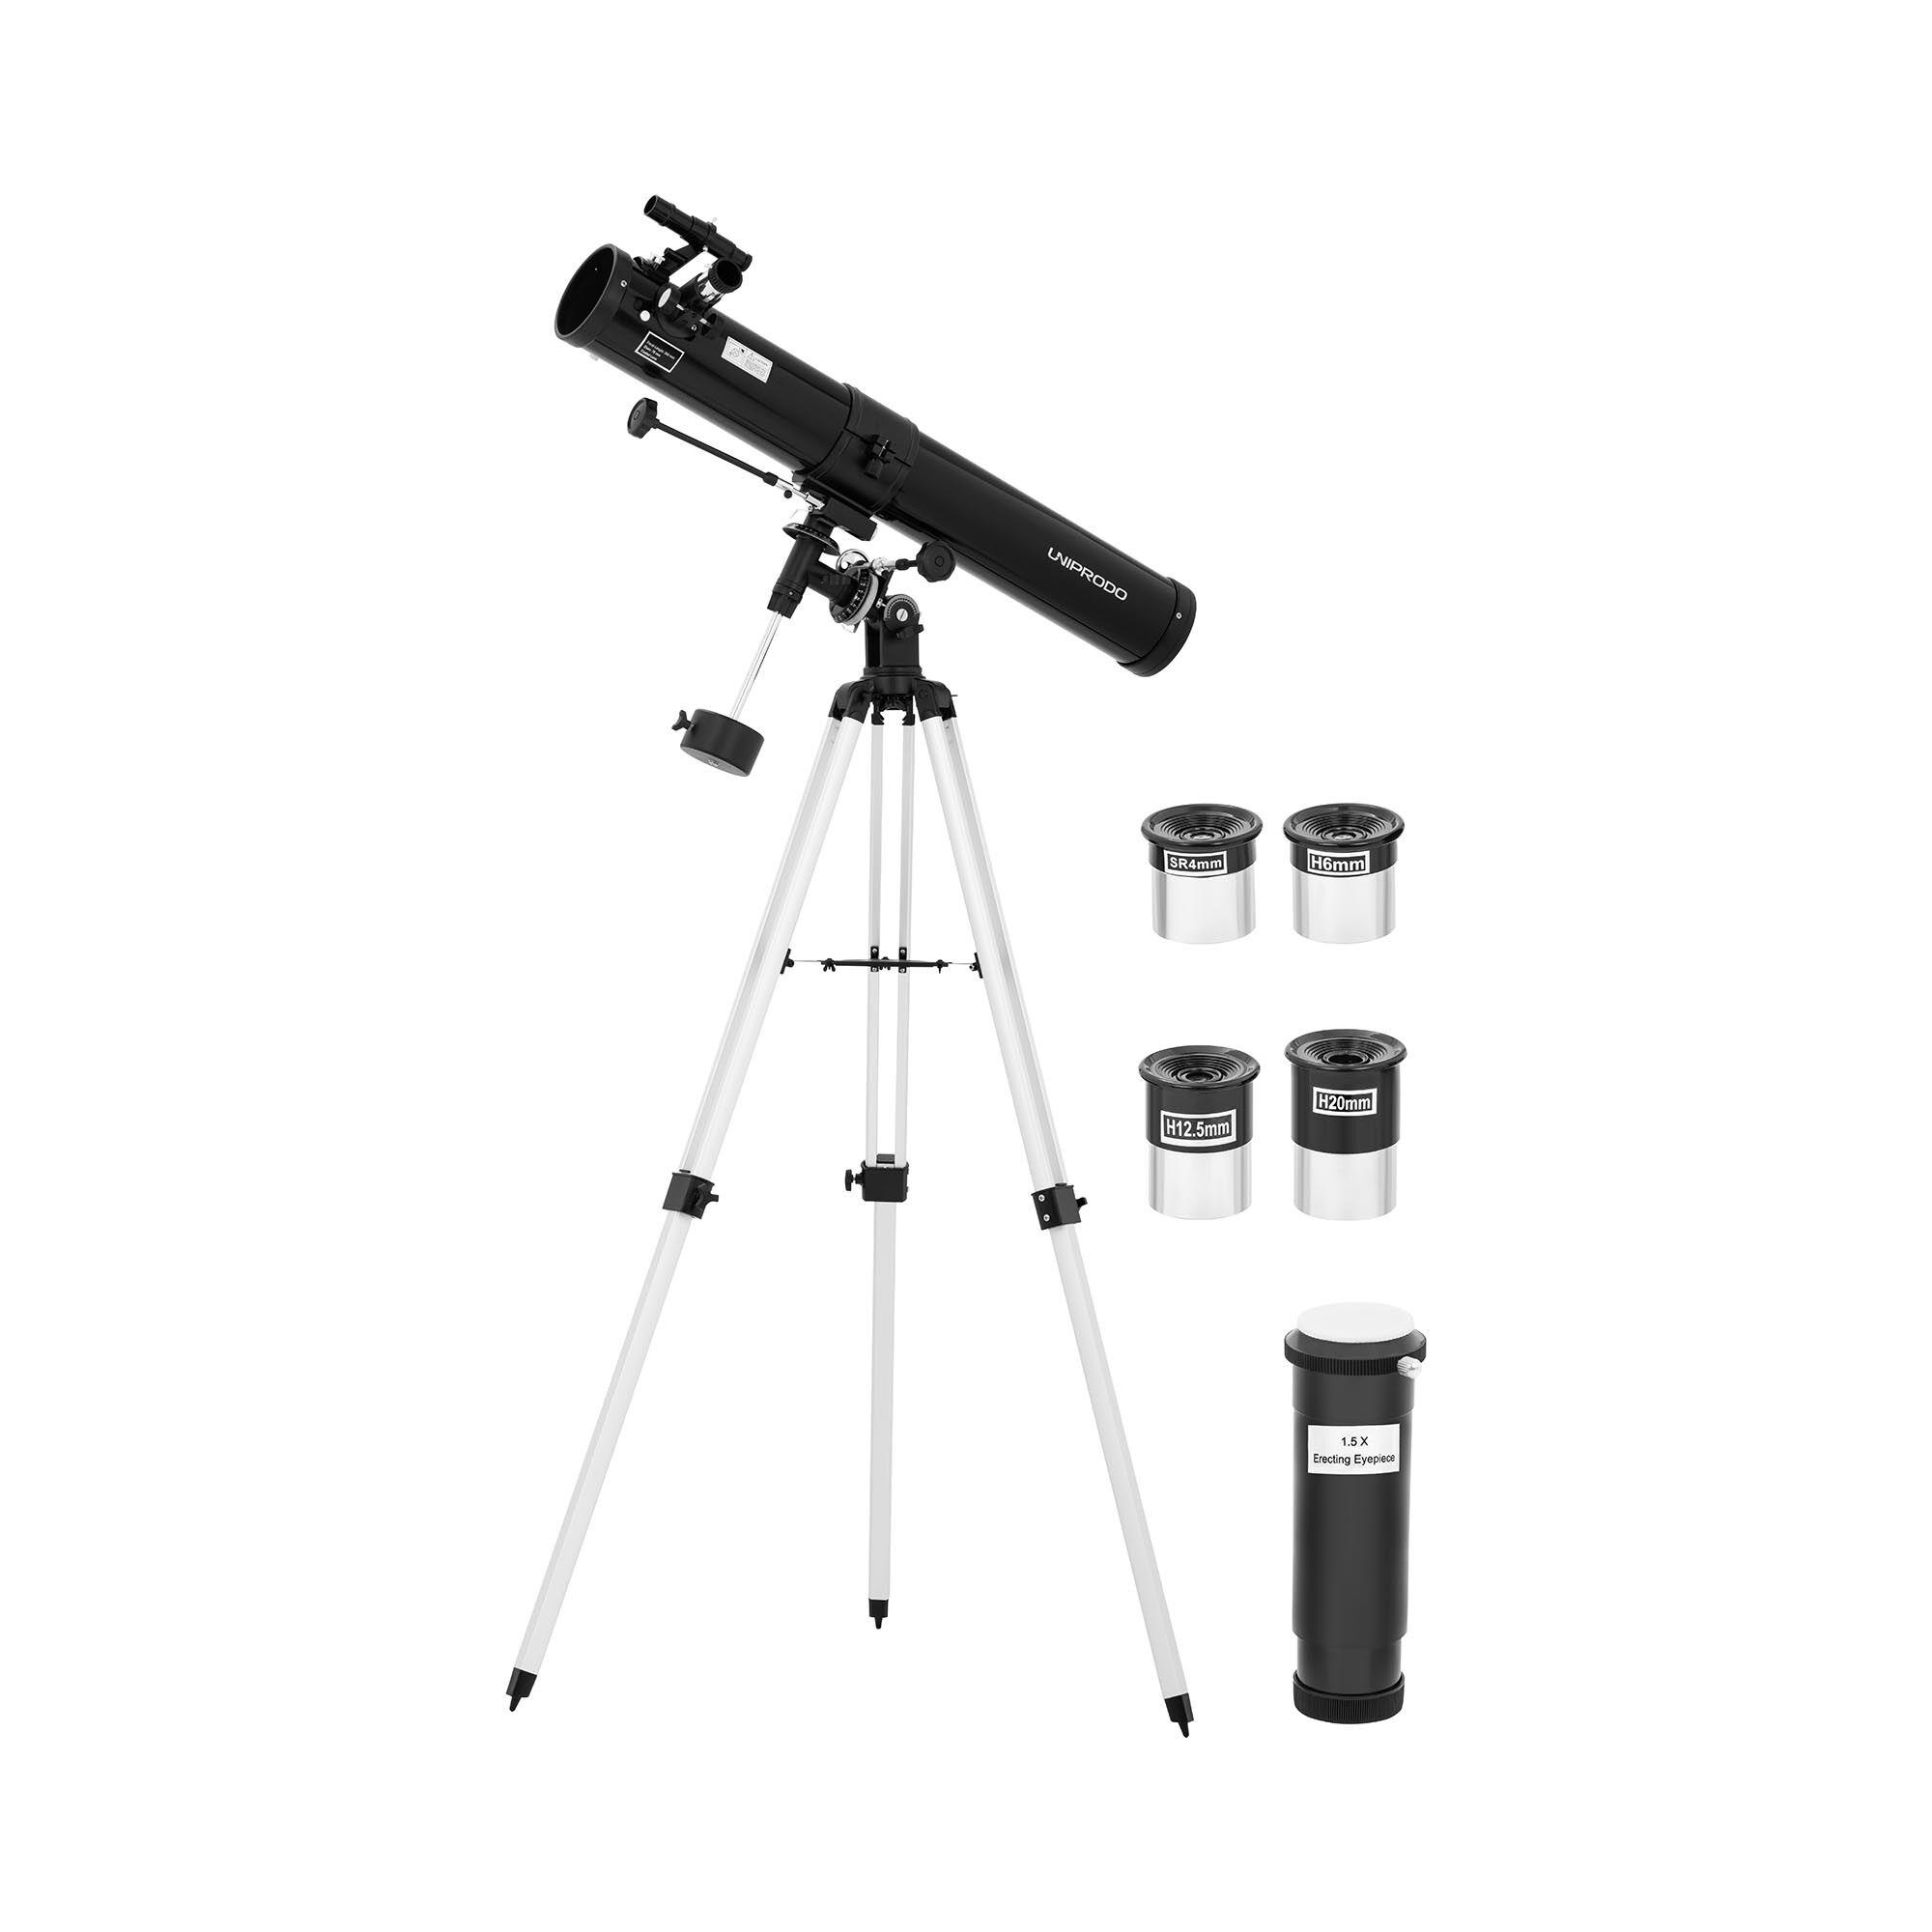 Uniprodo Telescope - Ø 76 mm - 900 mm - tripod UNI_TELESCOPE_10